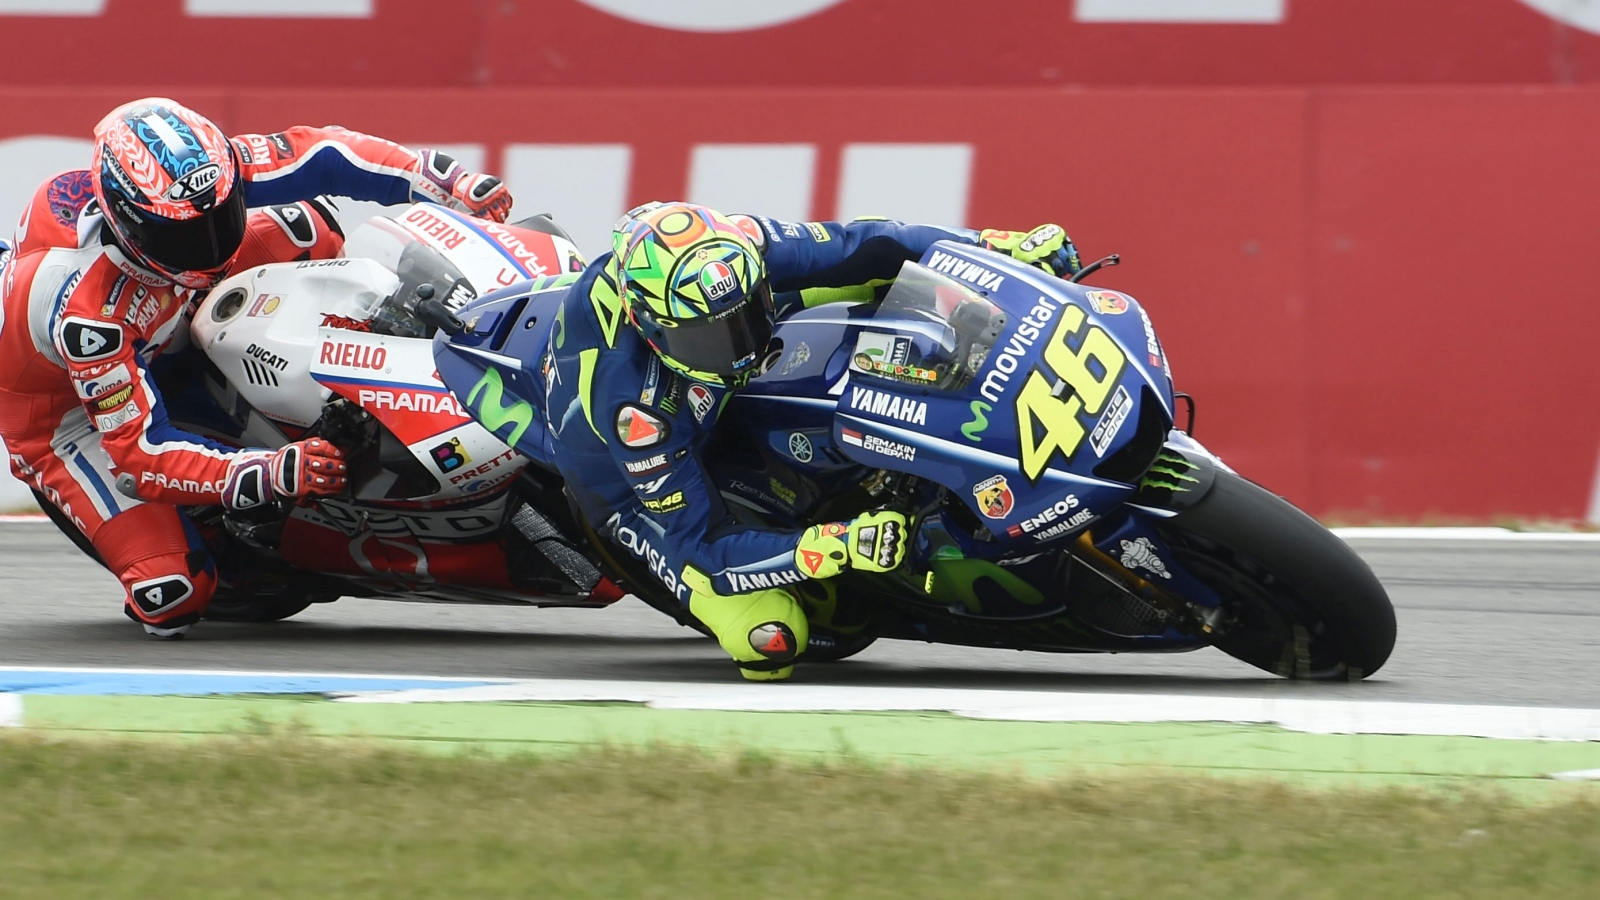 25 años Valentino Rossi: 2017 – 5º MotoGP – Yamaha YZR-M1 / Movistar Yamaha MotoGP